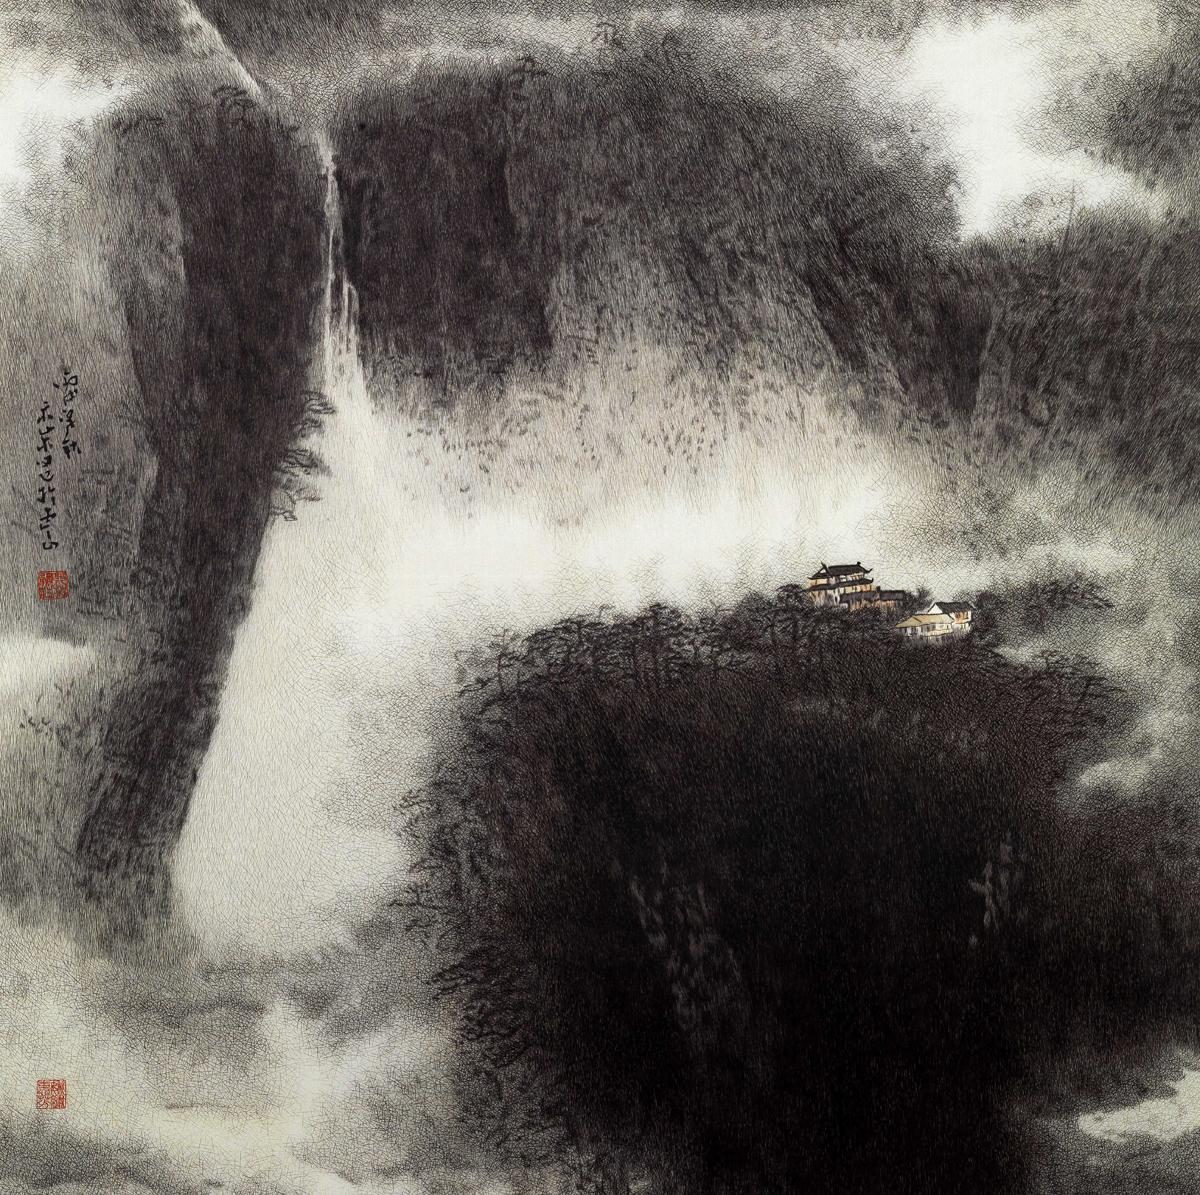 Paesaggio , ricamo a cuciture casuali, 80x80cm, 2011